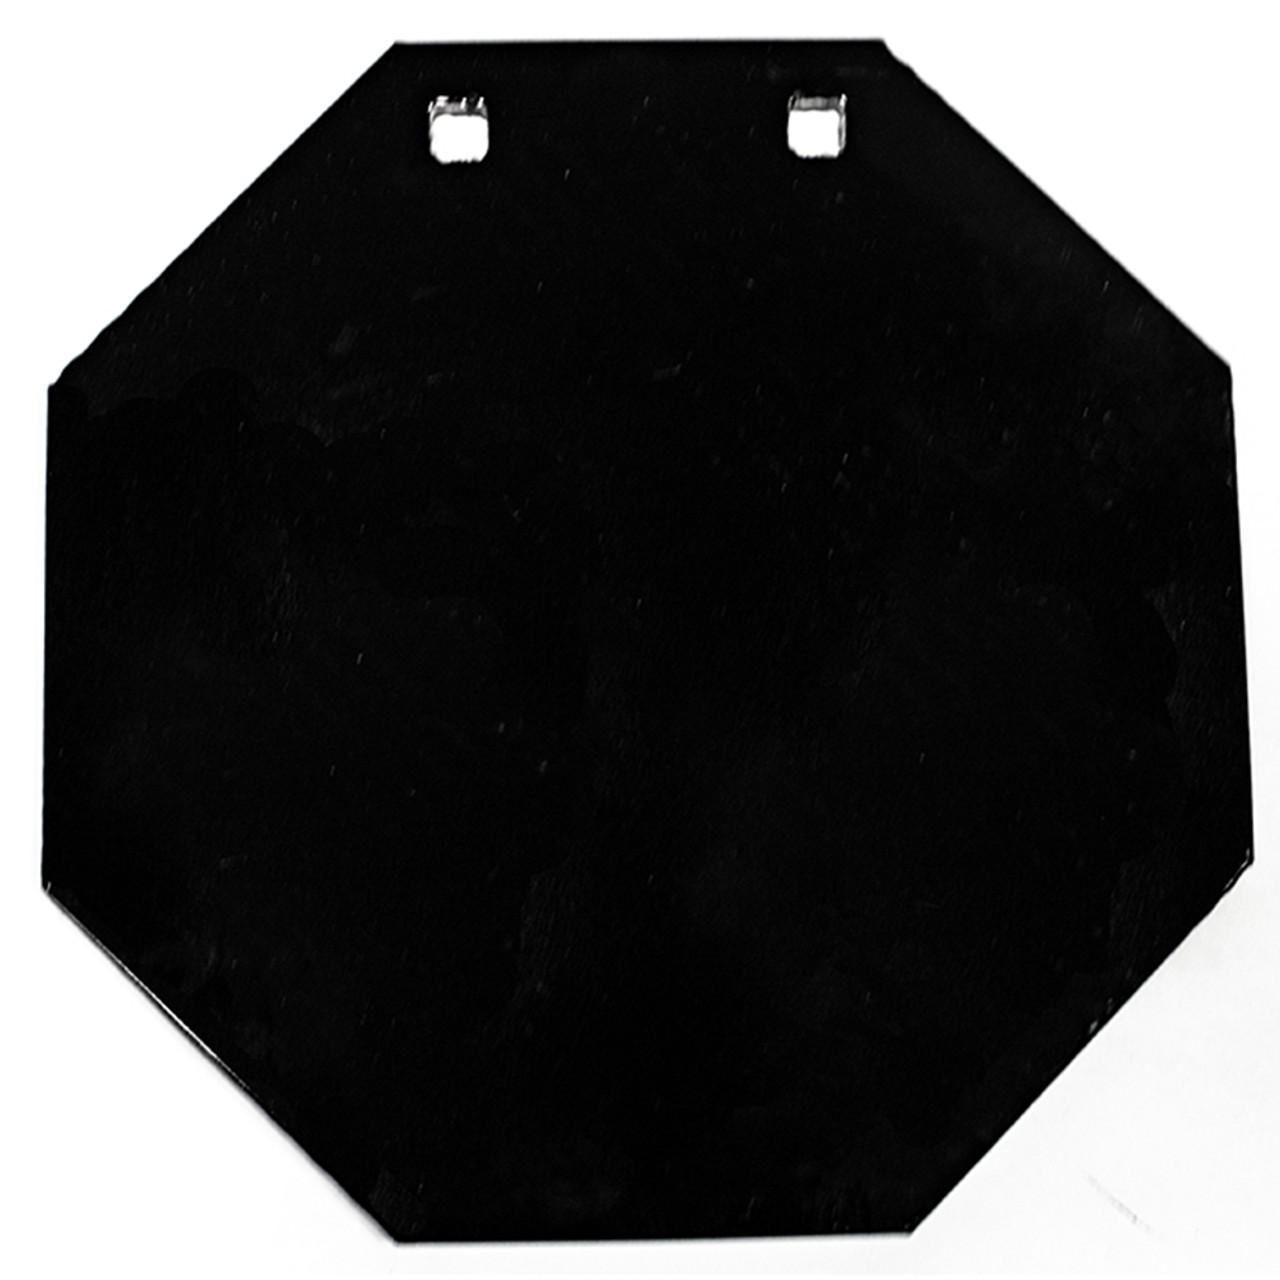 AR500 Steel Target Combo Kit